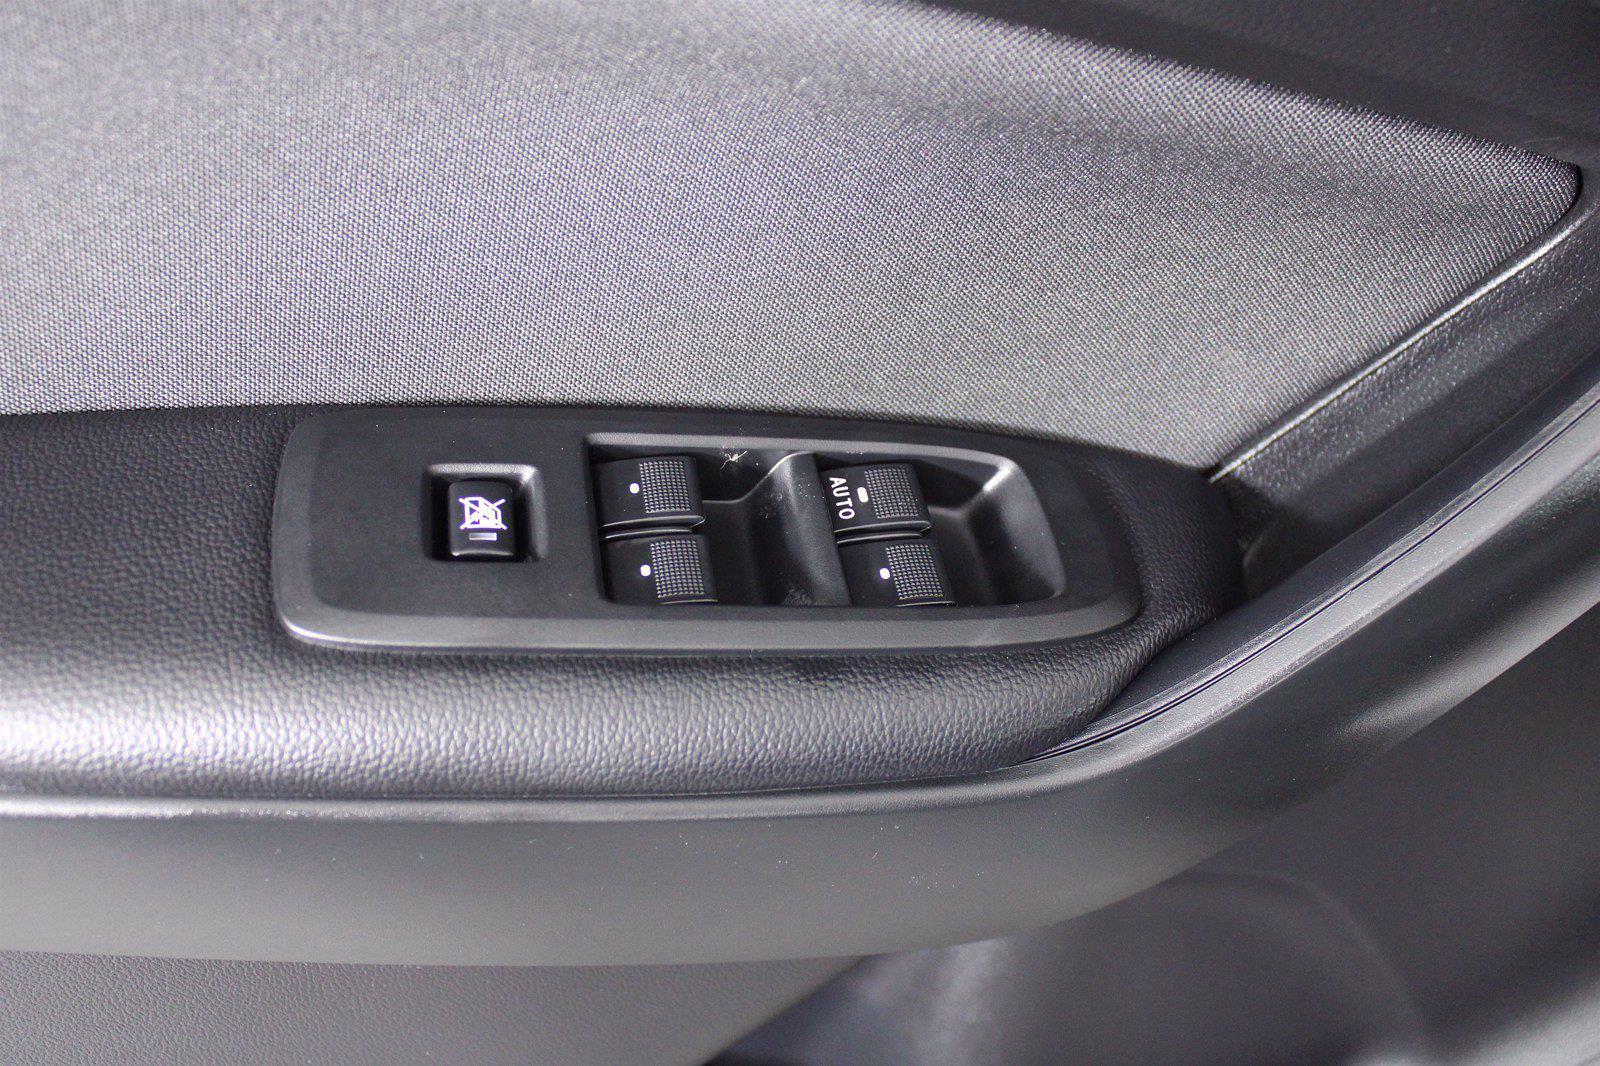 2020 Ranger SuperCrew Cab 4x4,  Pickup #D920110A - photo 15